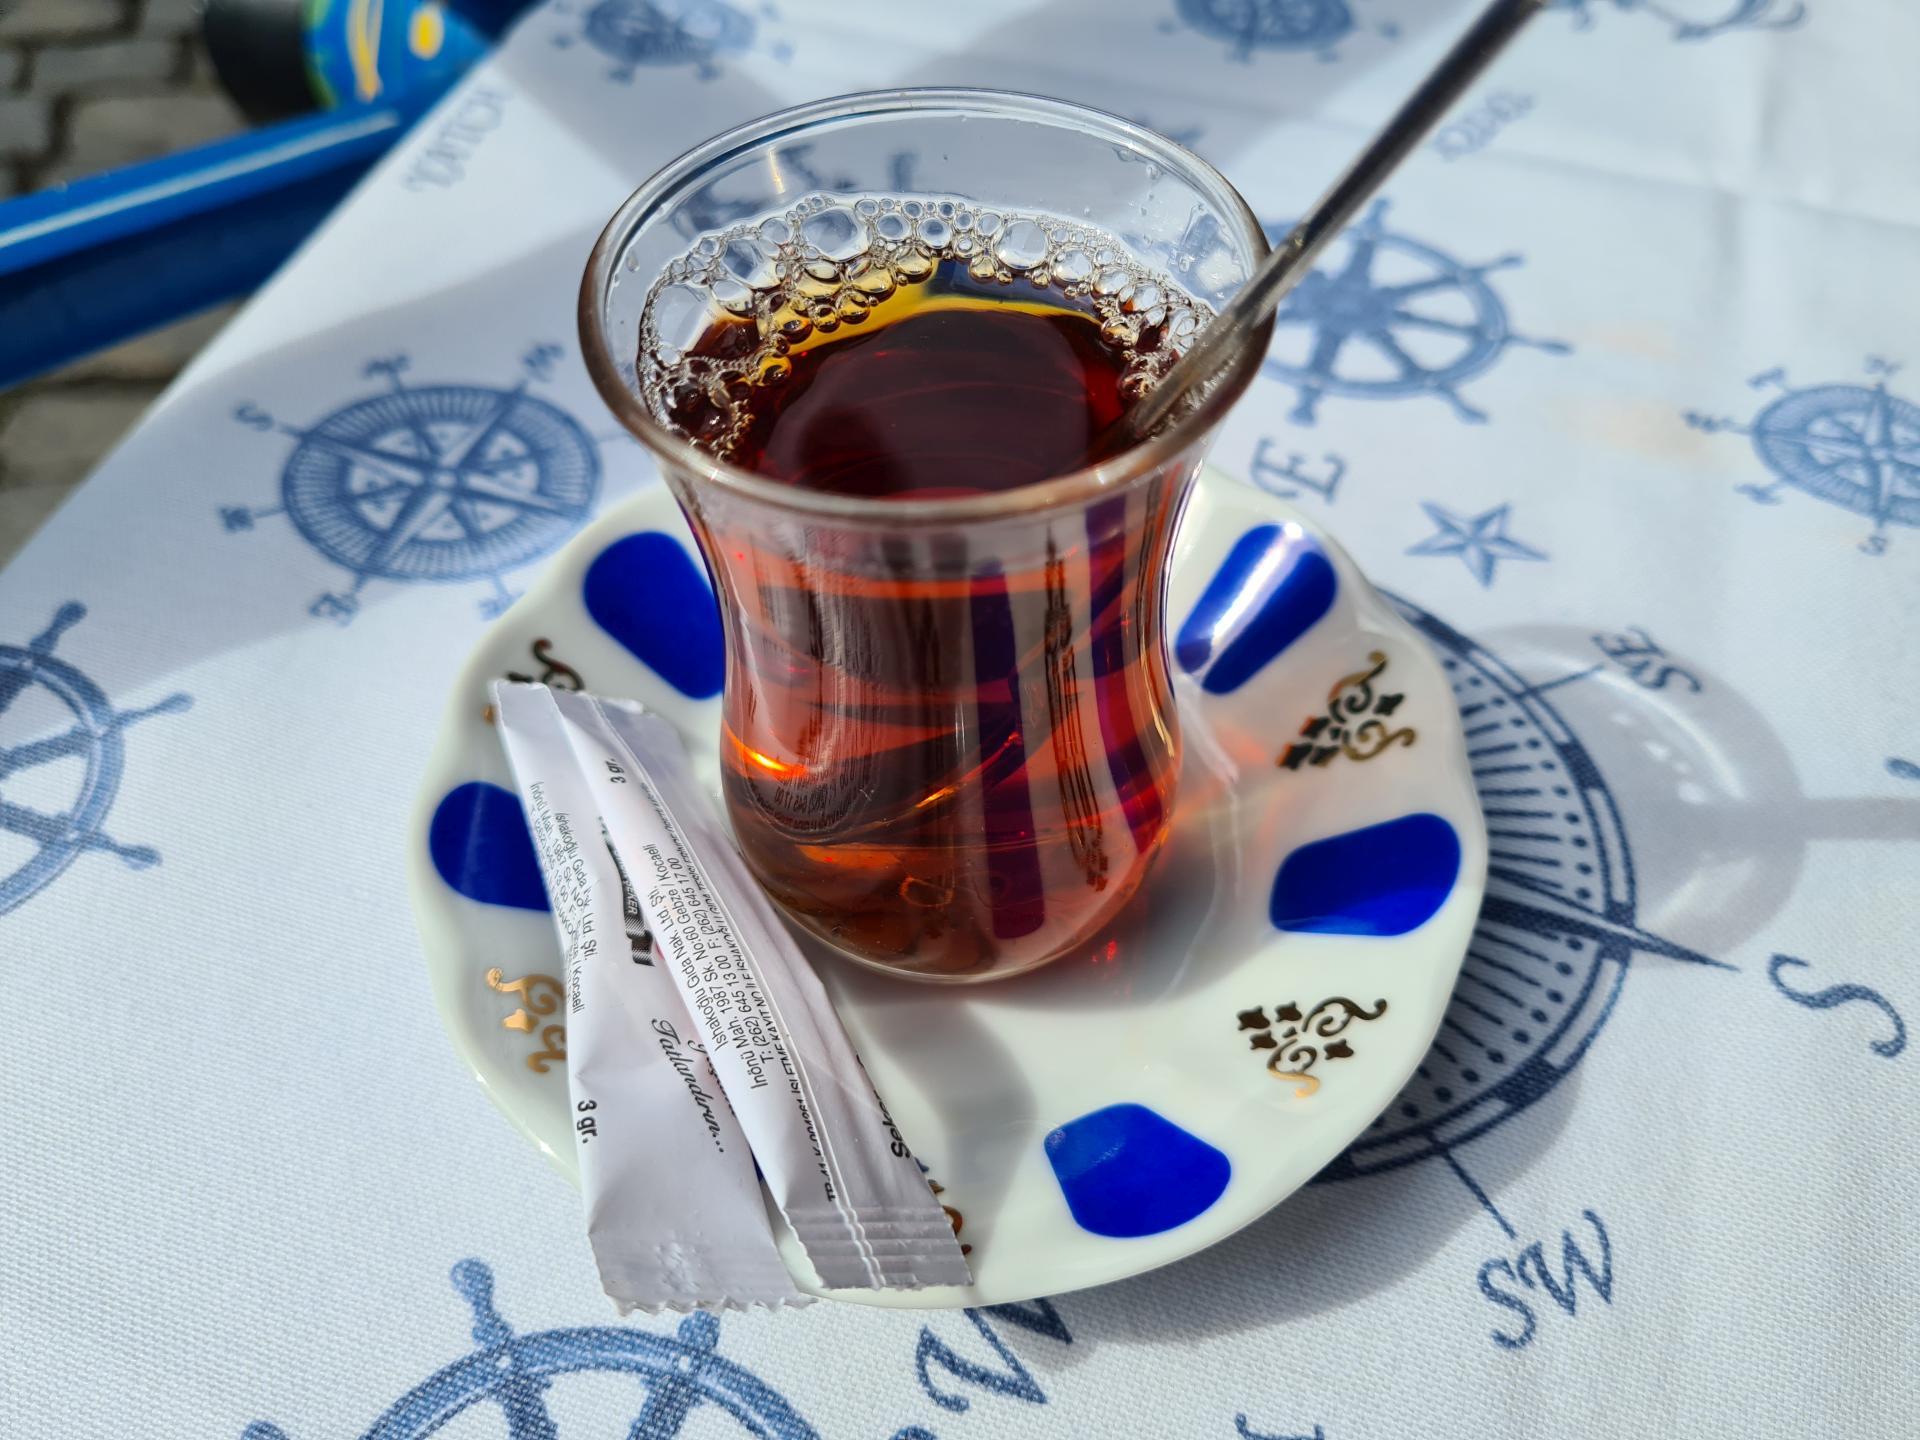 турецкий чай в пиале